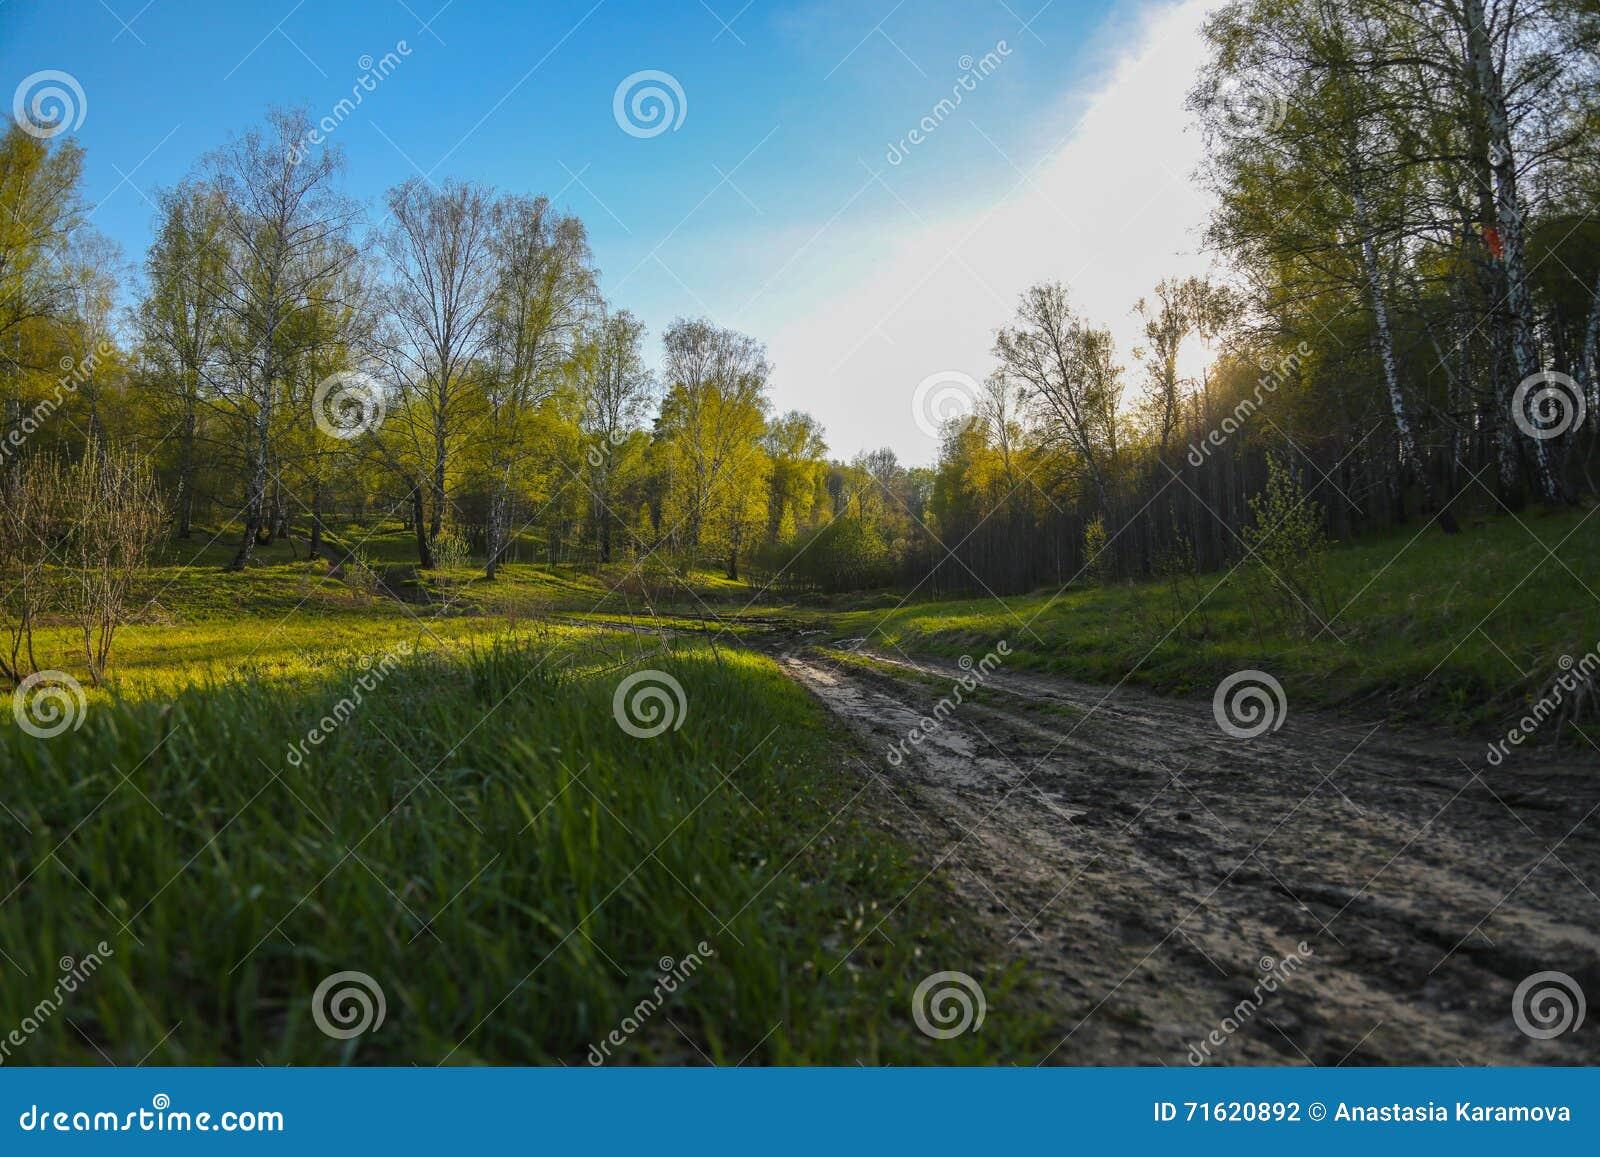 Unset in den Wald